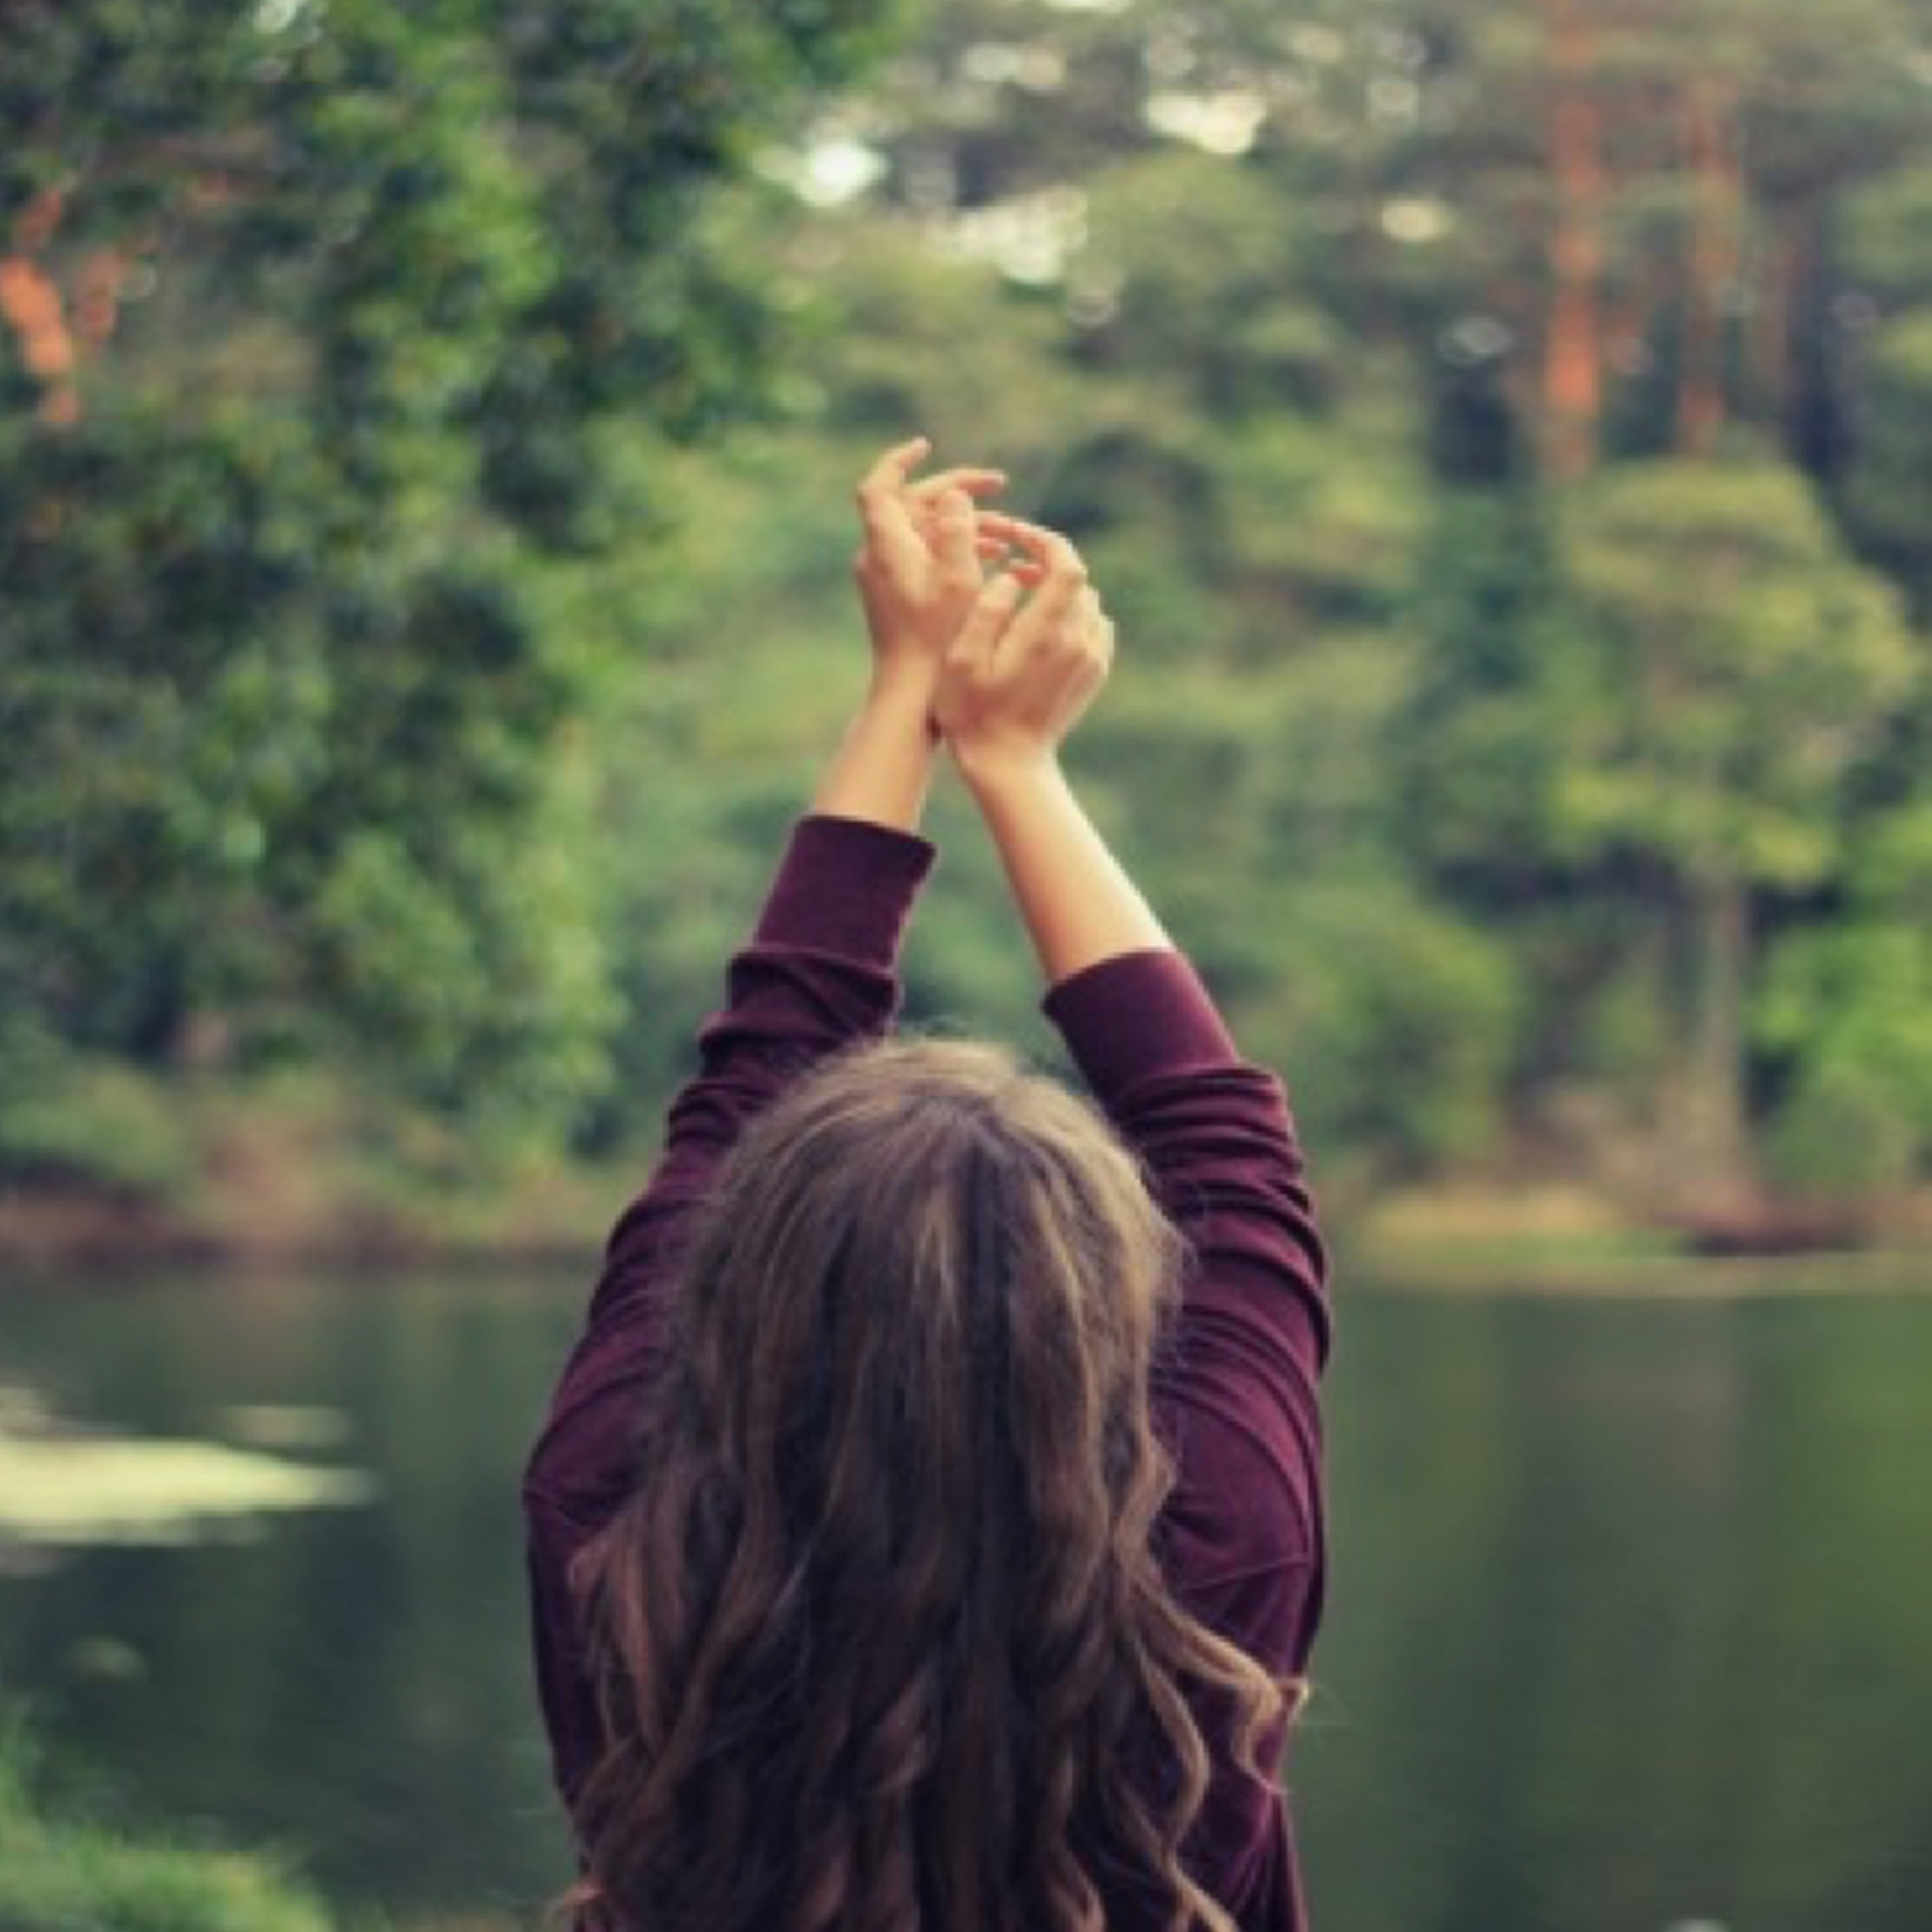 Woman-raising-hands.jpg